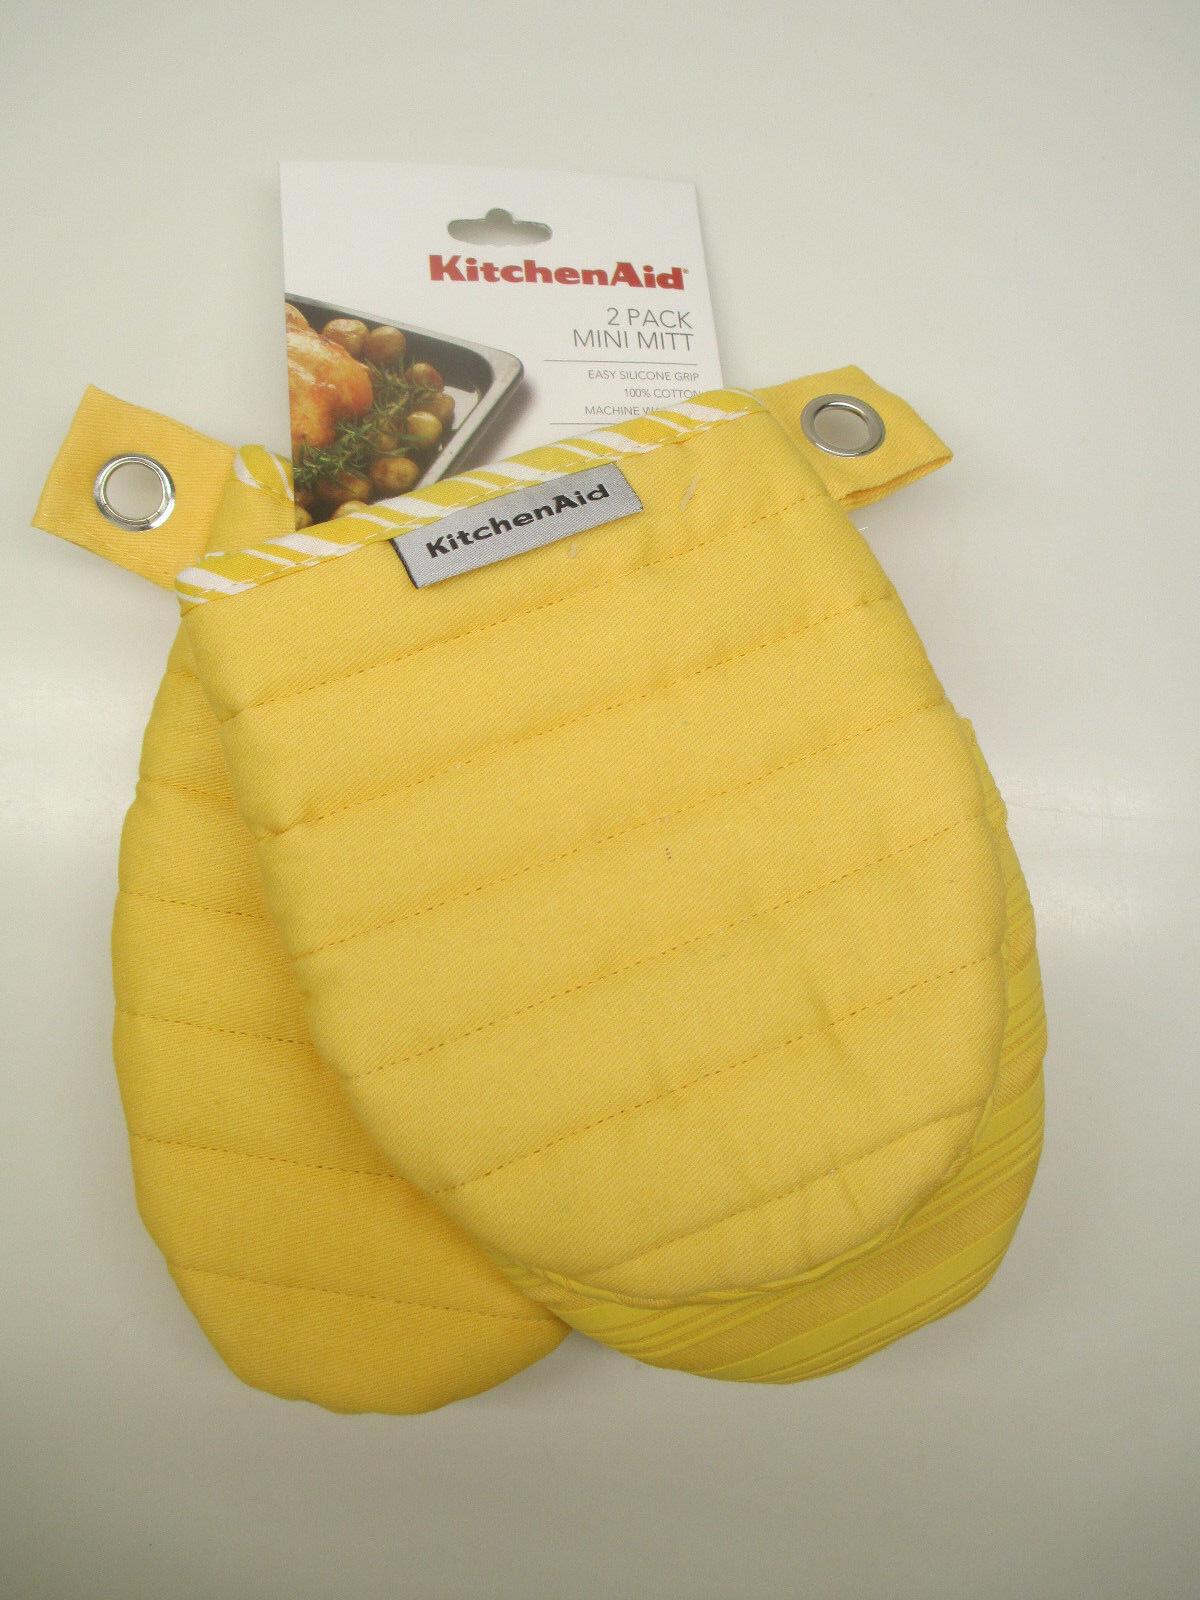 Kitchenaid 2 pack of mini oven mitt mitts choice of color 100 cotton - Kitchenaid oven gloves ...